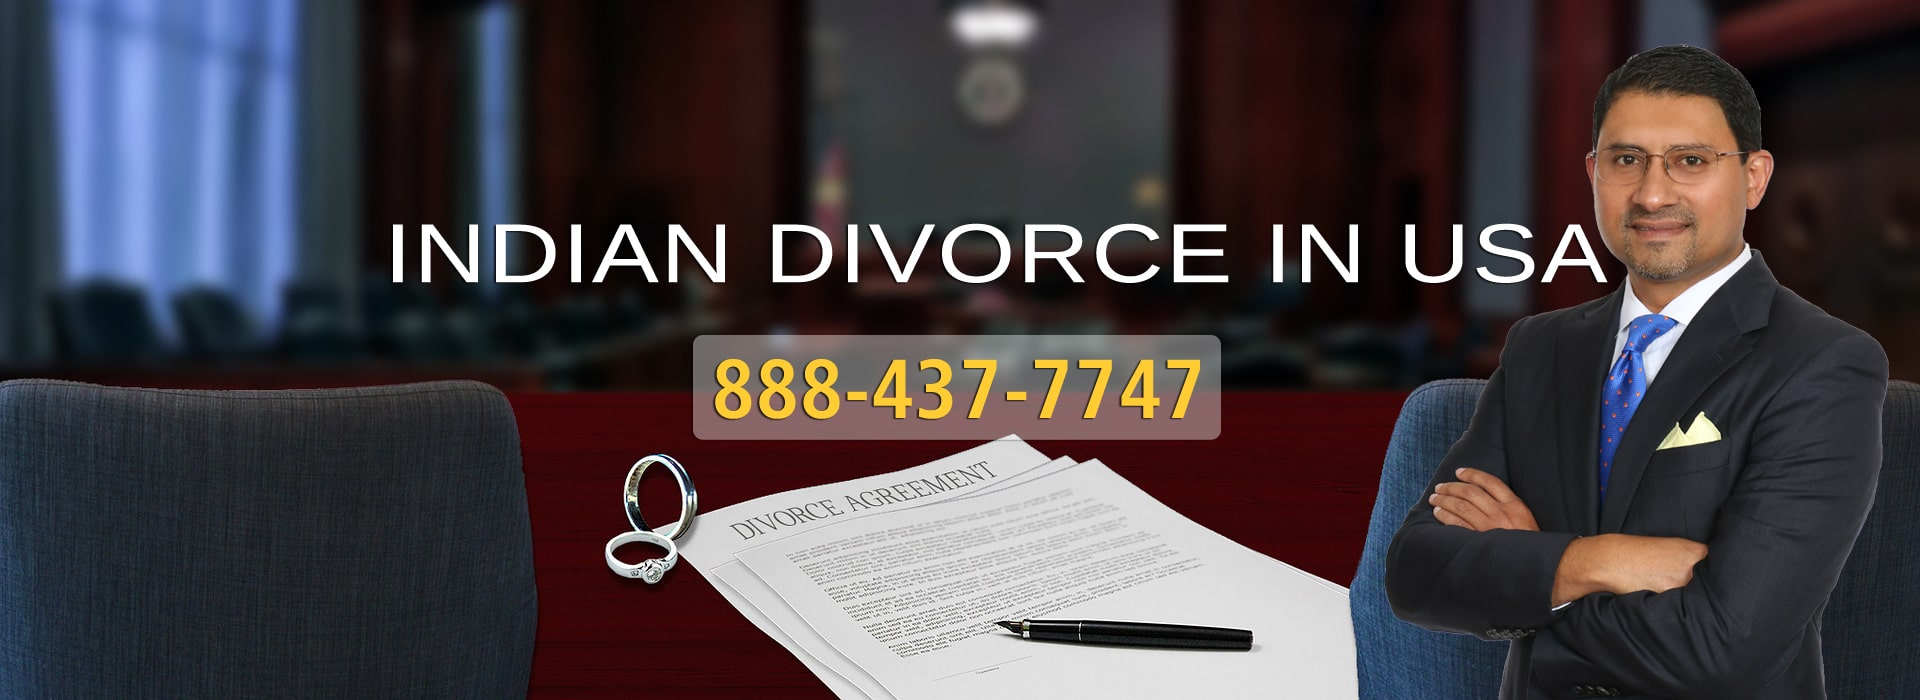 Indian Divorce In USA Virginia Maryland DC